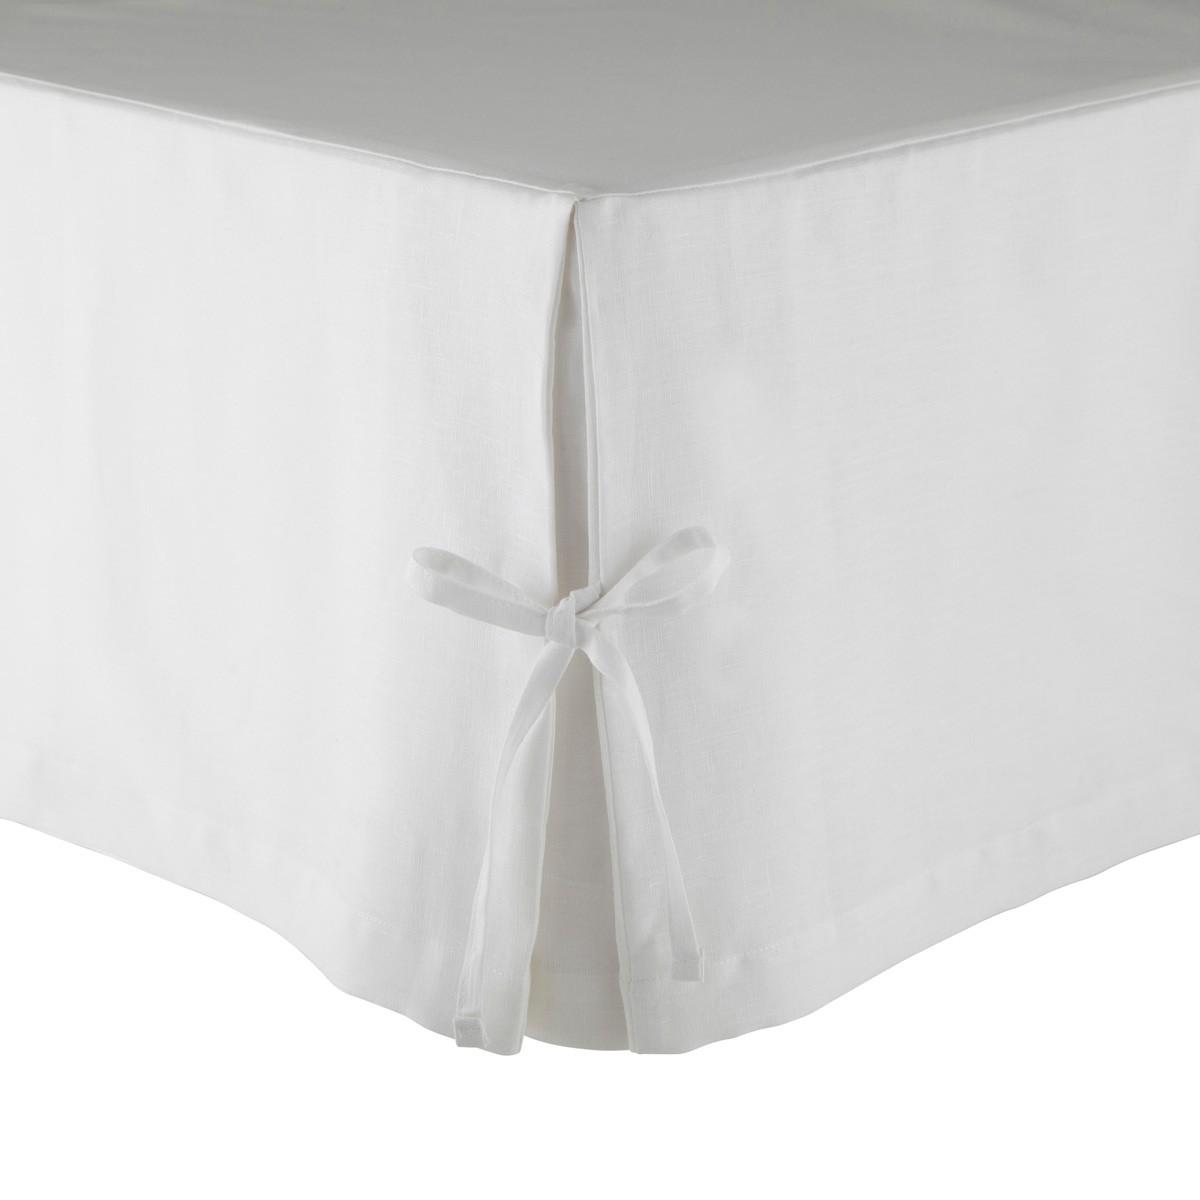 Cache sommier Lin Blanc 200 x 200 cm